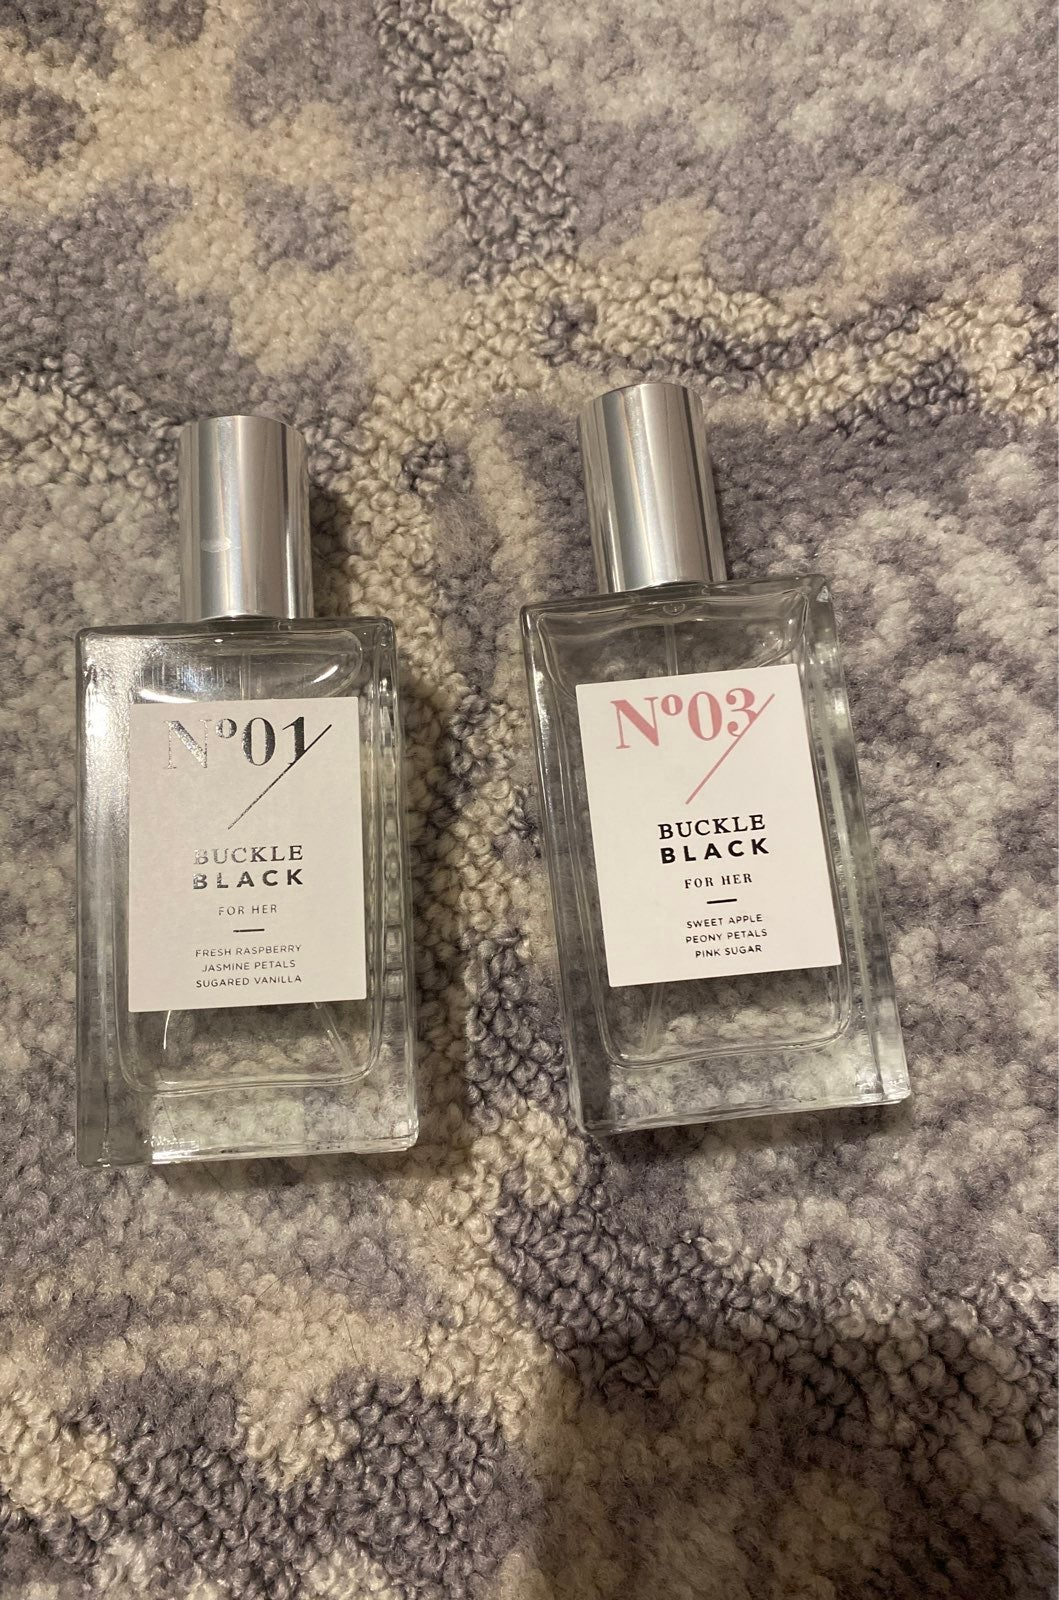 Buckle perfume